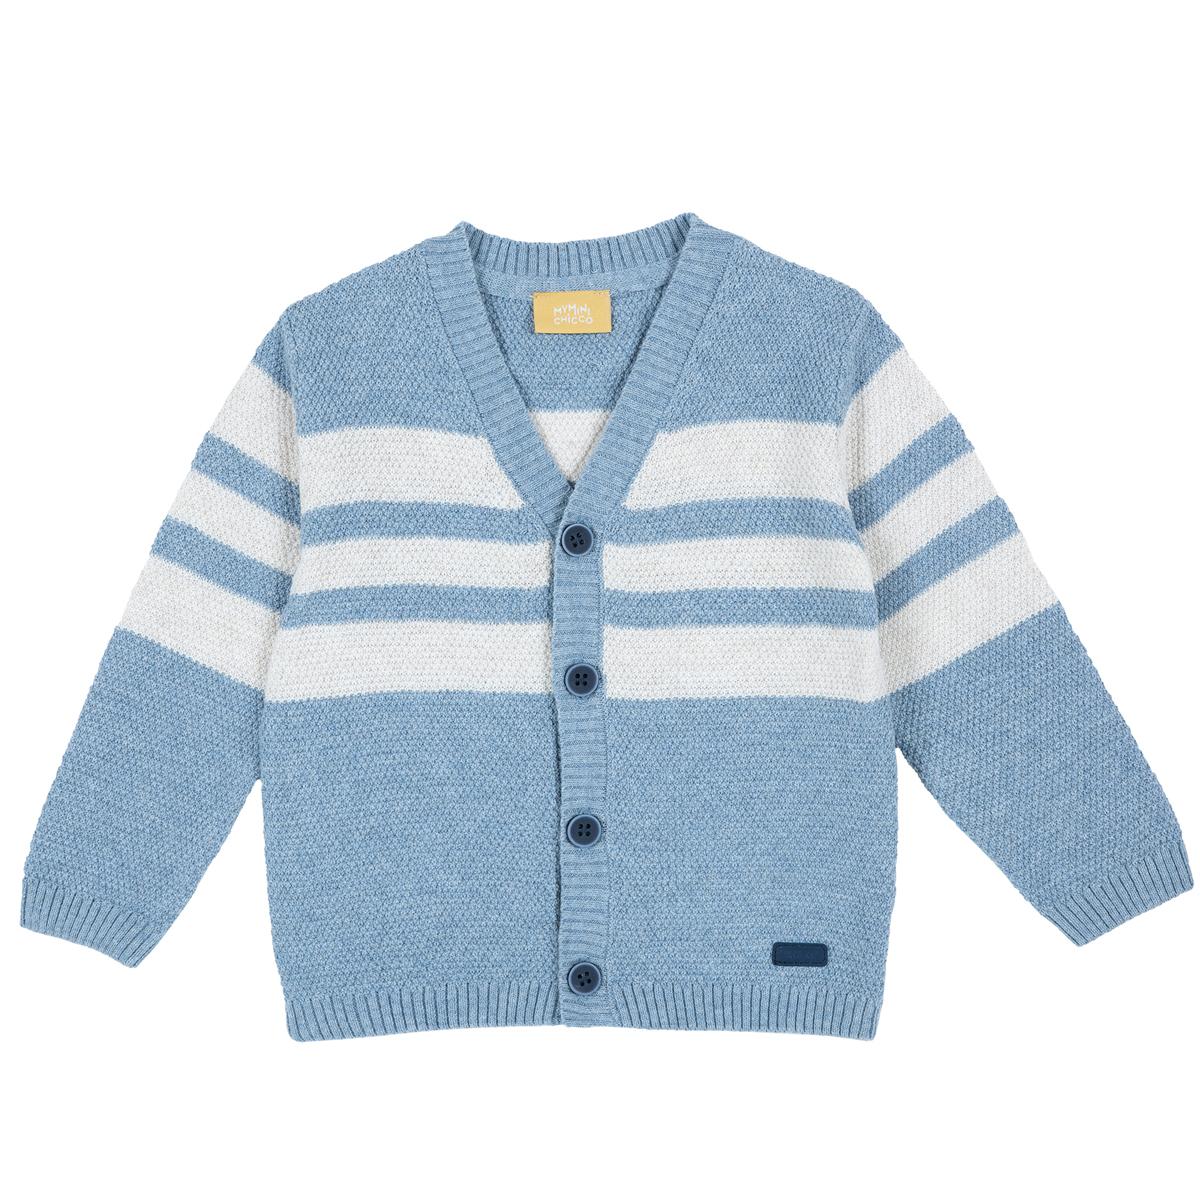 Cardigan copii Chicco, inchidere nasturi, albastru deschis, 96849 din categoria Cardigan copii